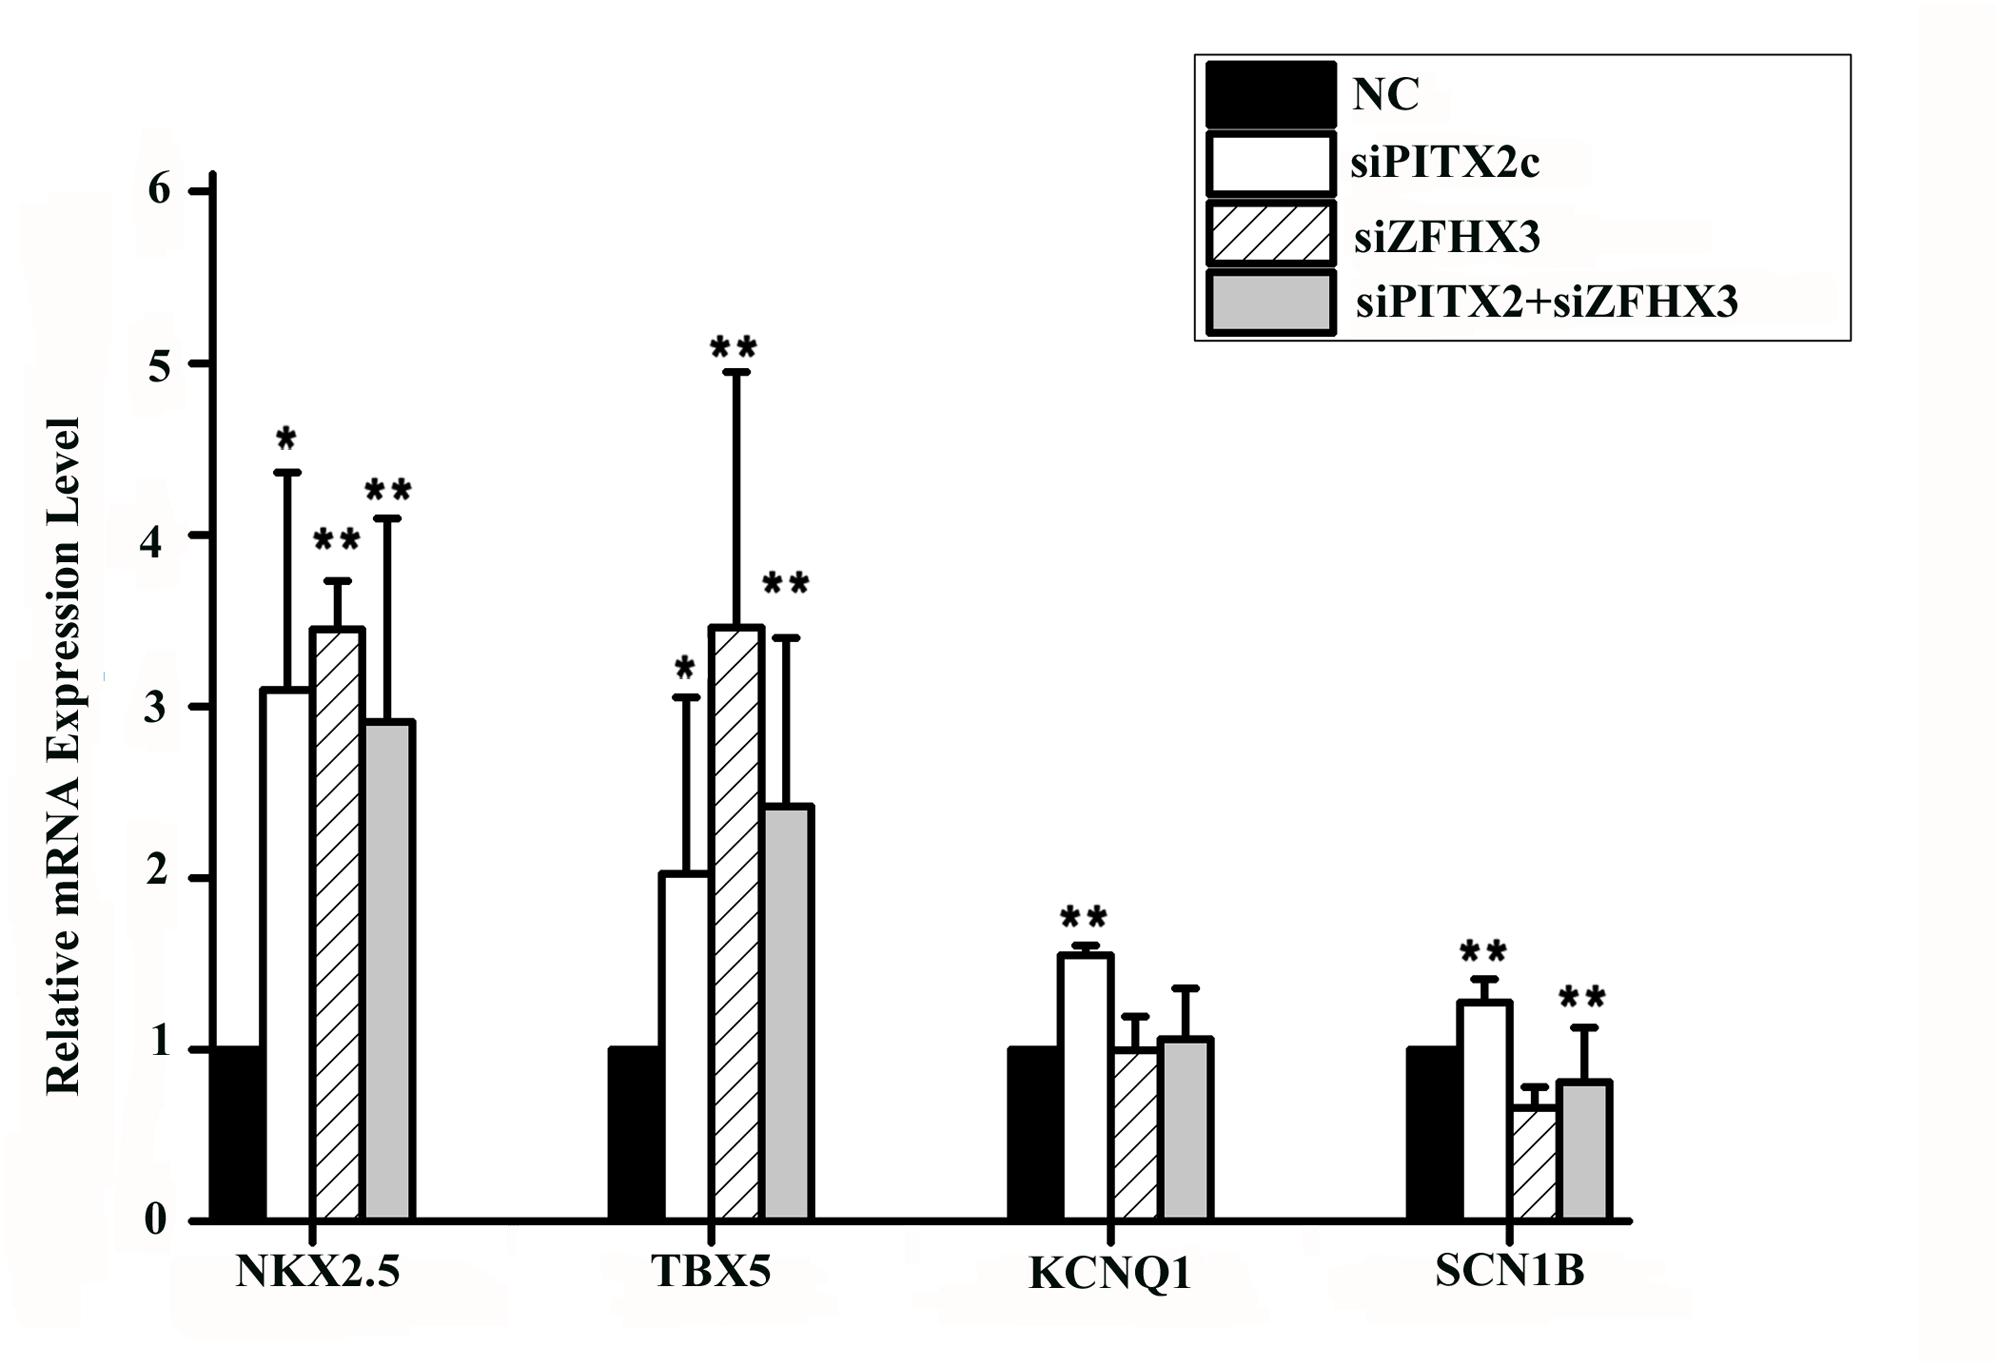 <i>PITX2c</i> and <i>ZFHX3</i> regulate expression of <i>NKX2</i>.<i>5</i>, <i>TBX5</i>, <i>KCNQ1</i> and <i>SCN1B</i>.